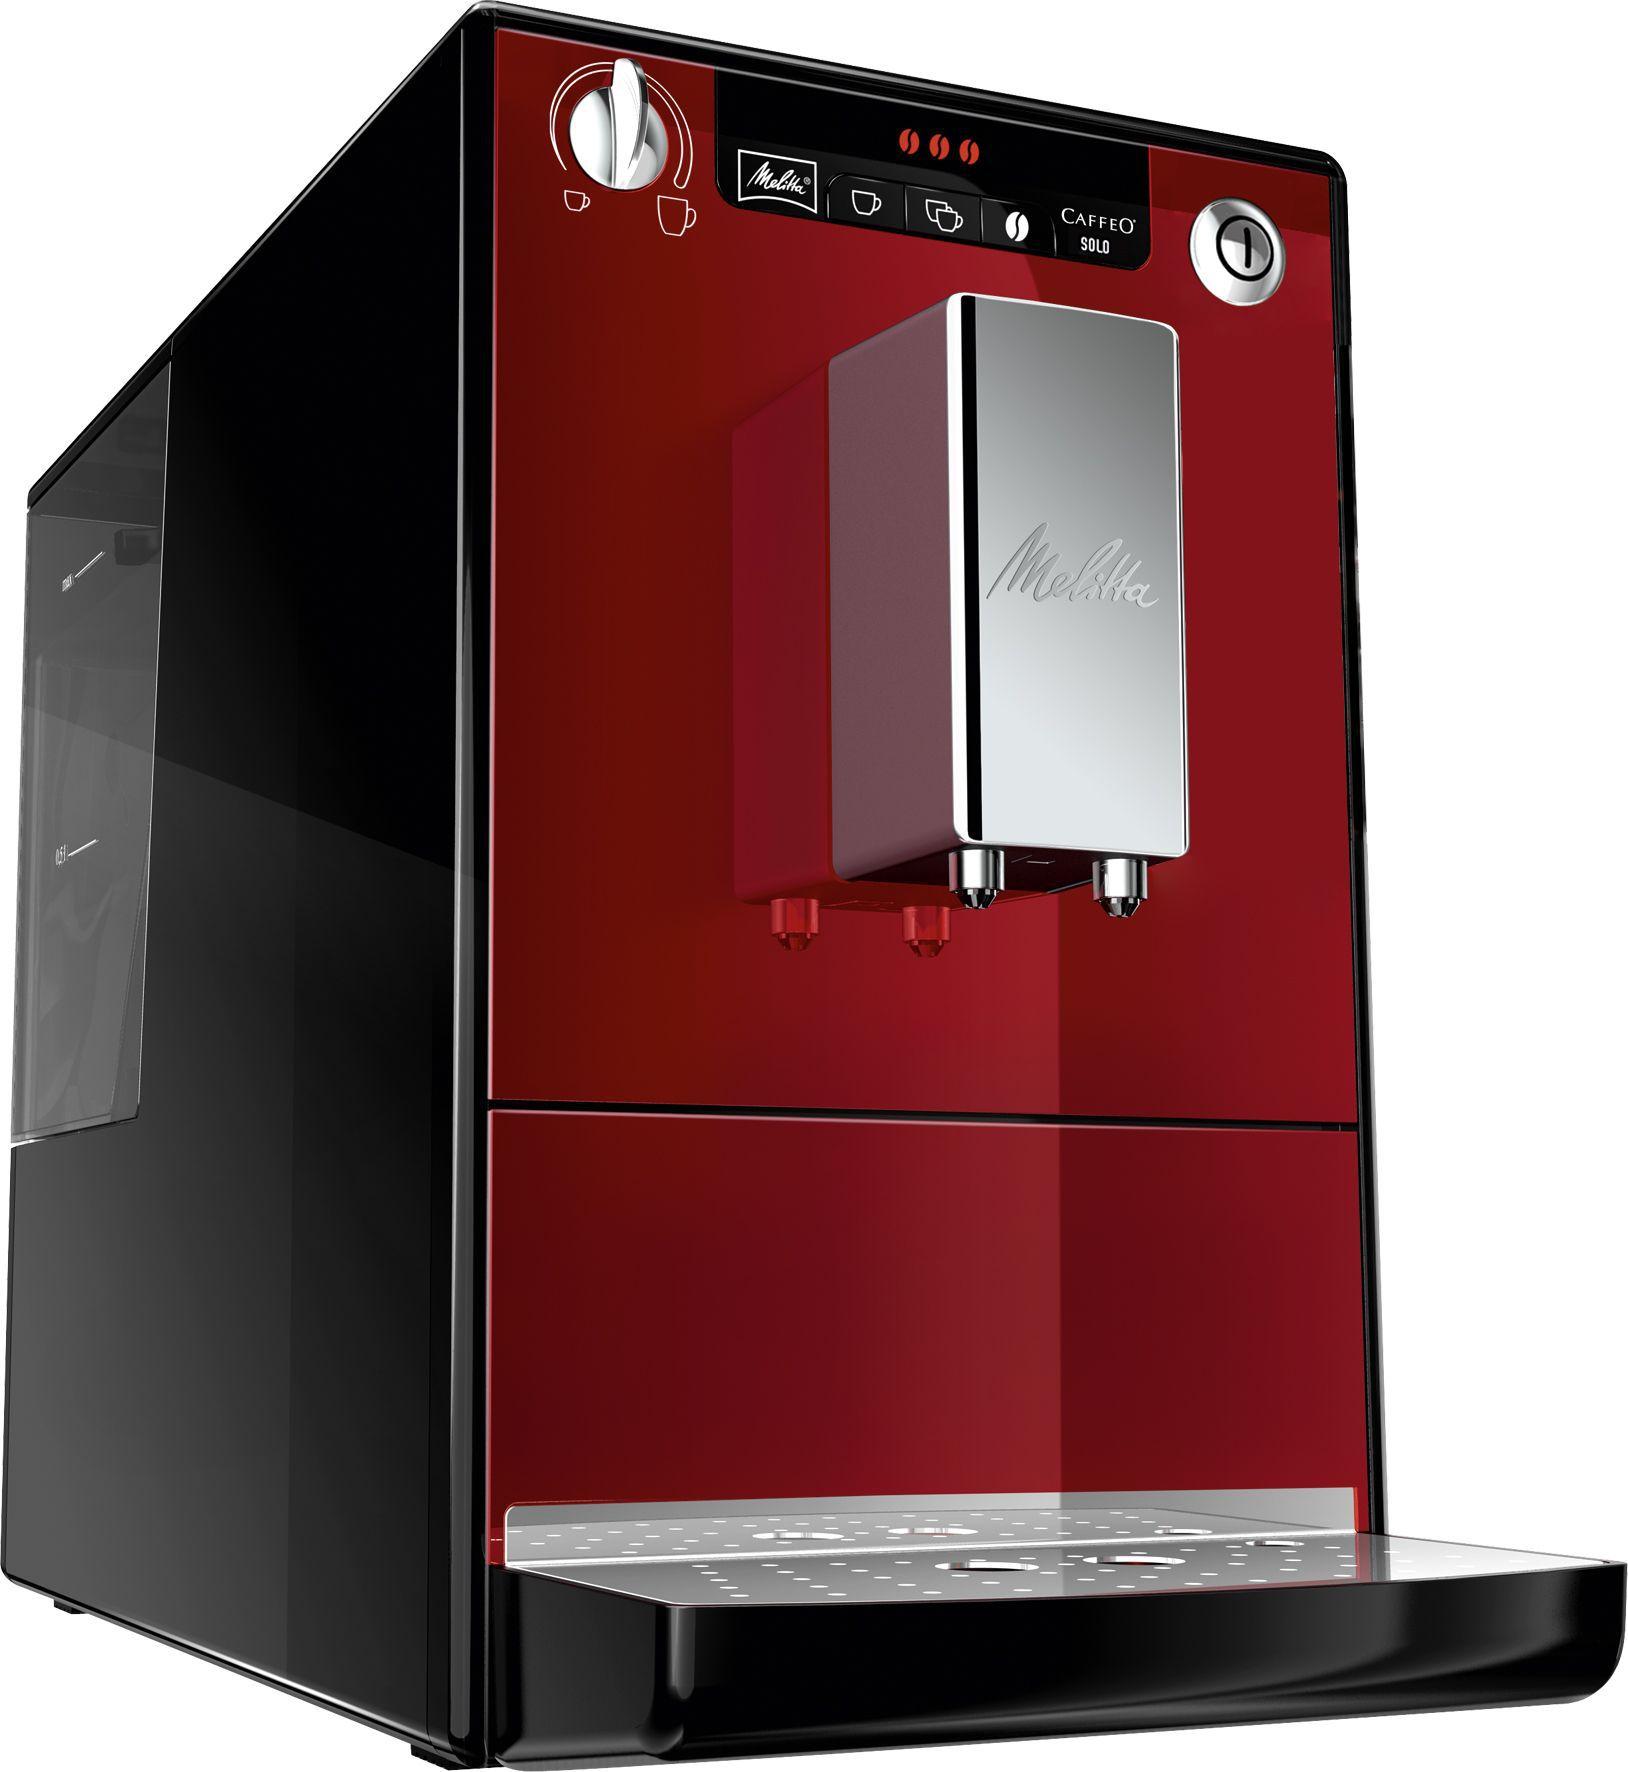 machine expresso automatique avec broyeur int gr achat vente moulin caf cdiscount. Black Bedroom Furniture Sets. Home Design Ideas